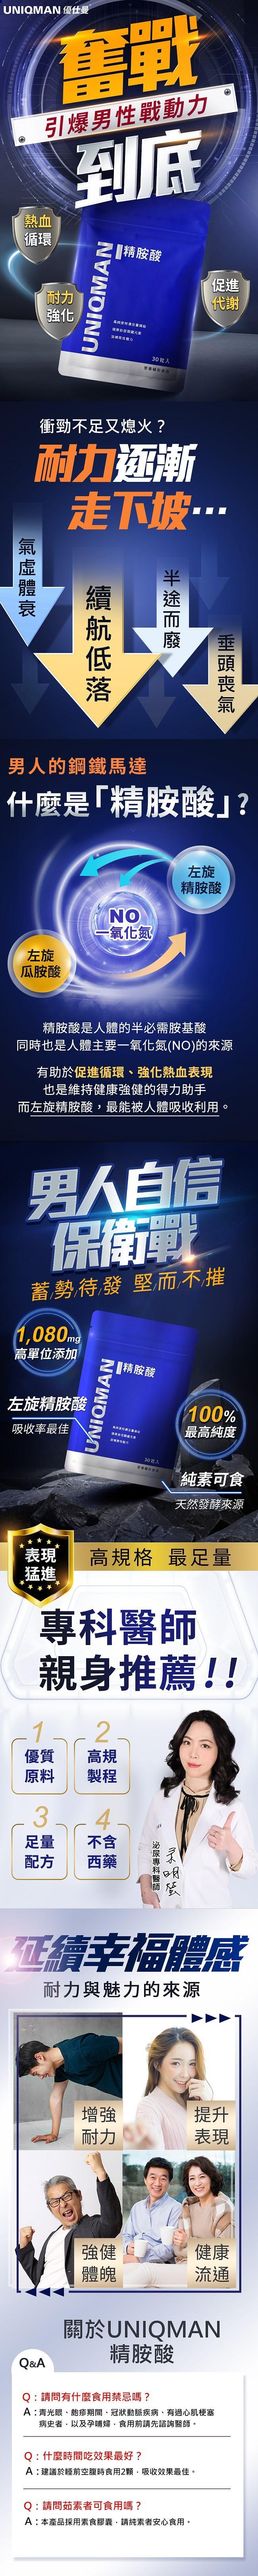 UNIQMAN-精胺酸膠囊食品(30粒/袋)3袋組產品資訊